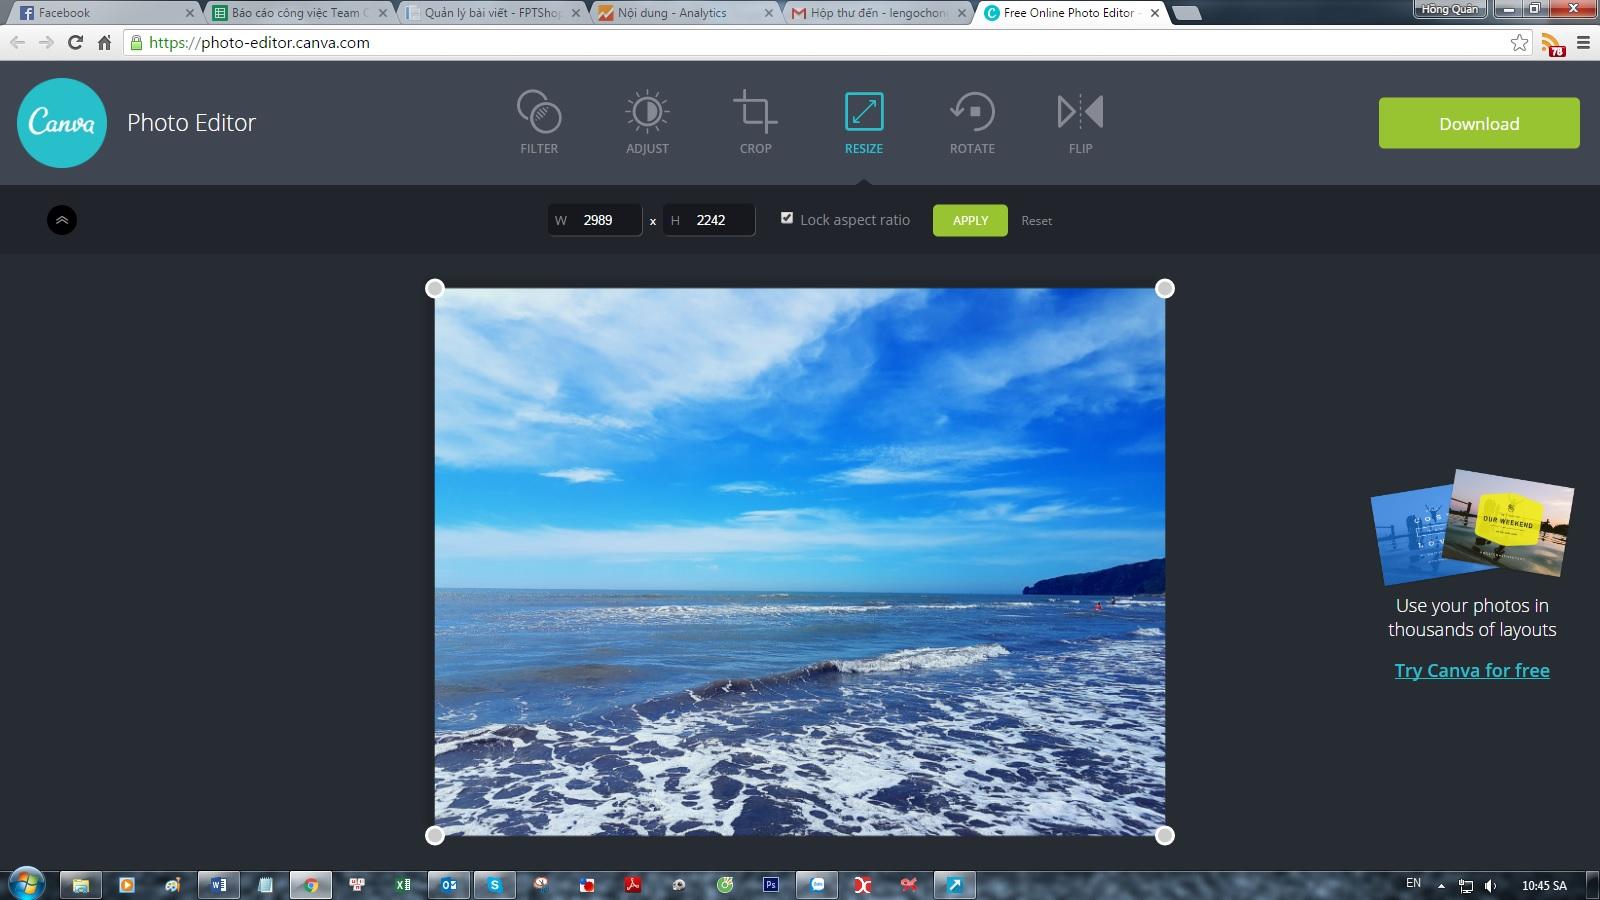 Canva Photo Editor